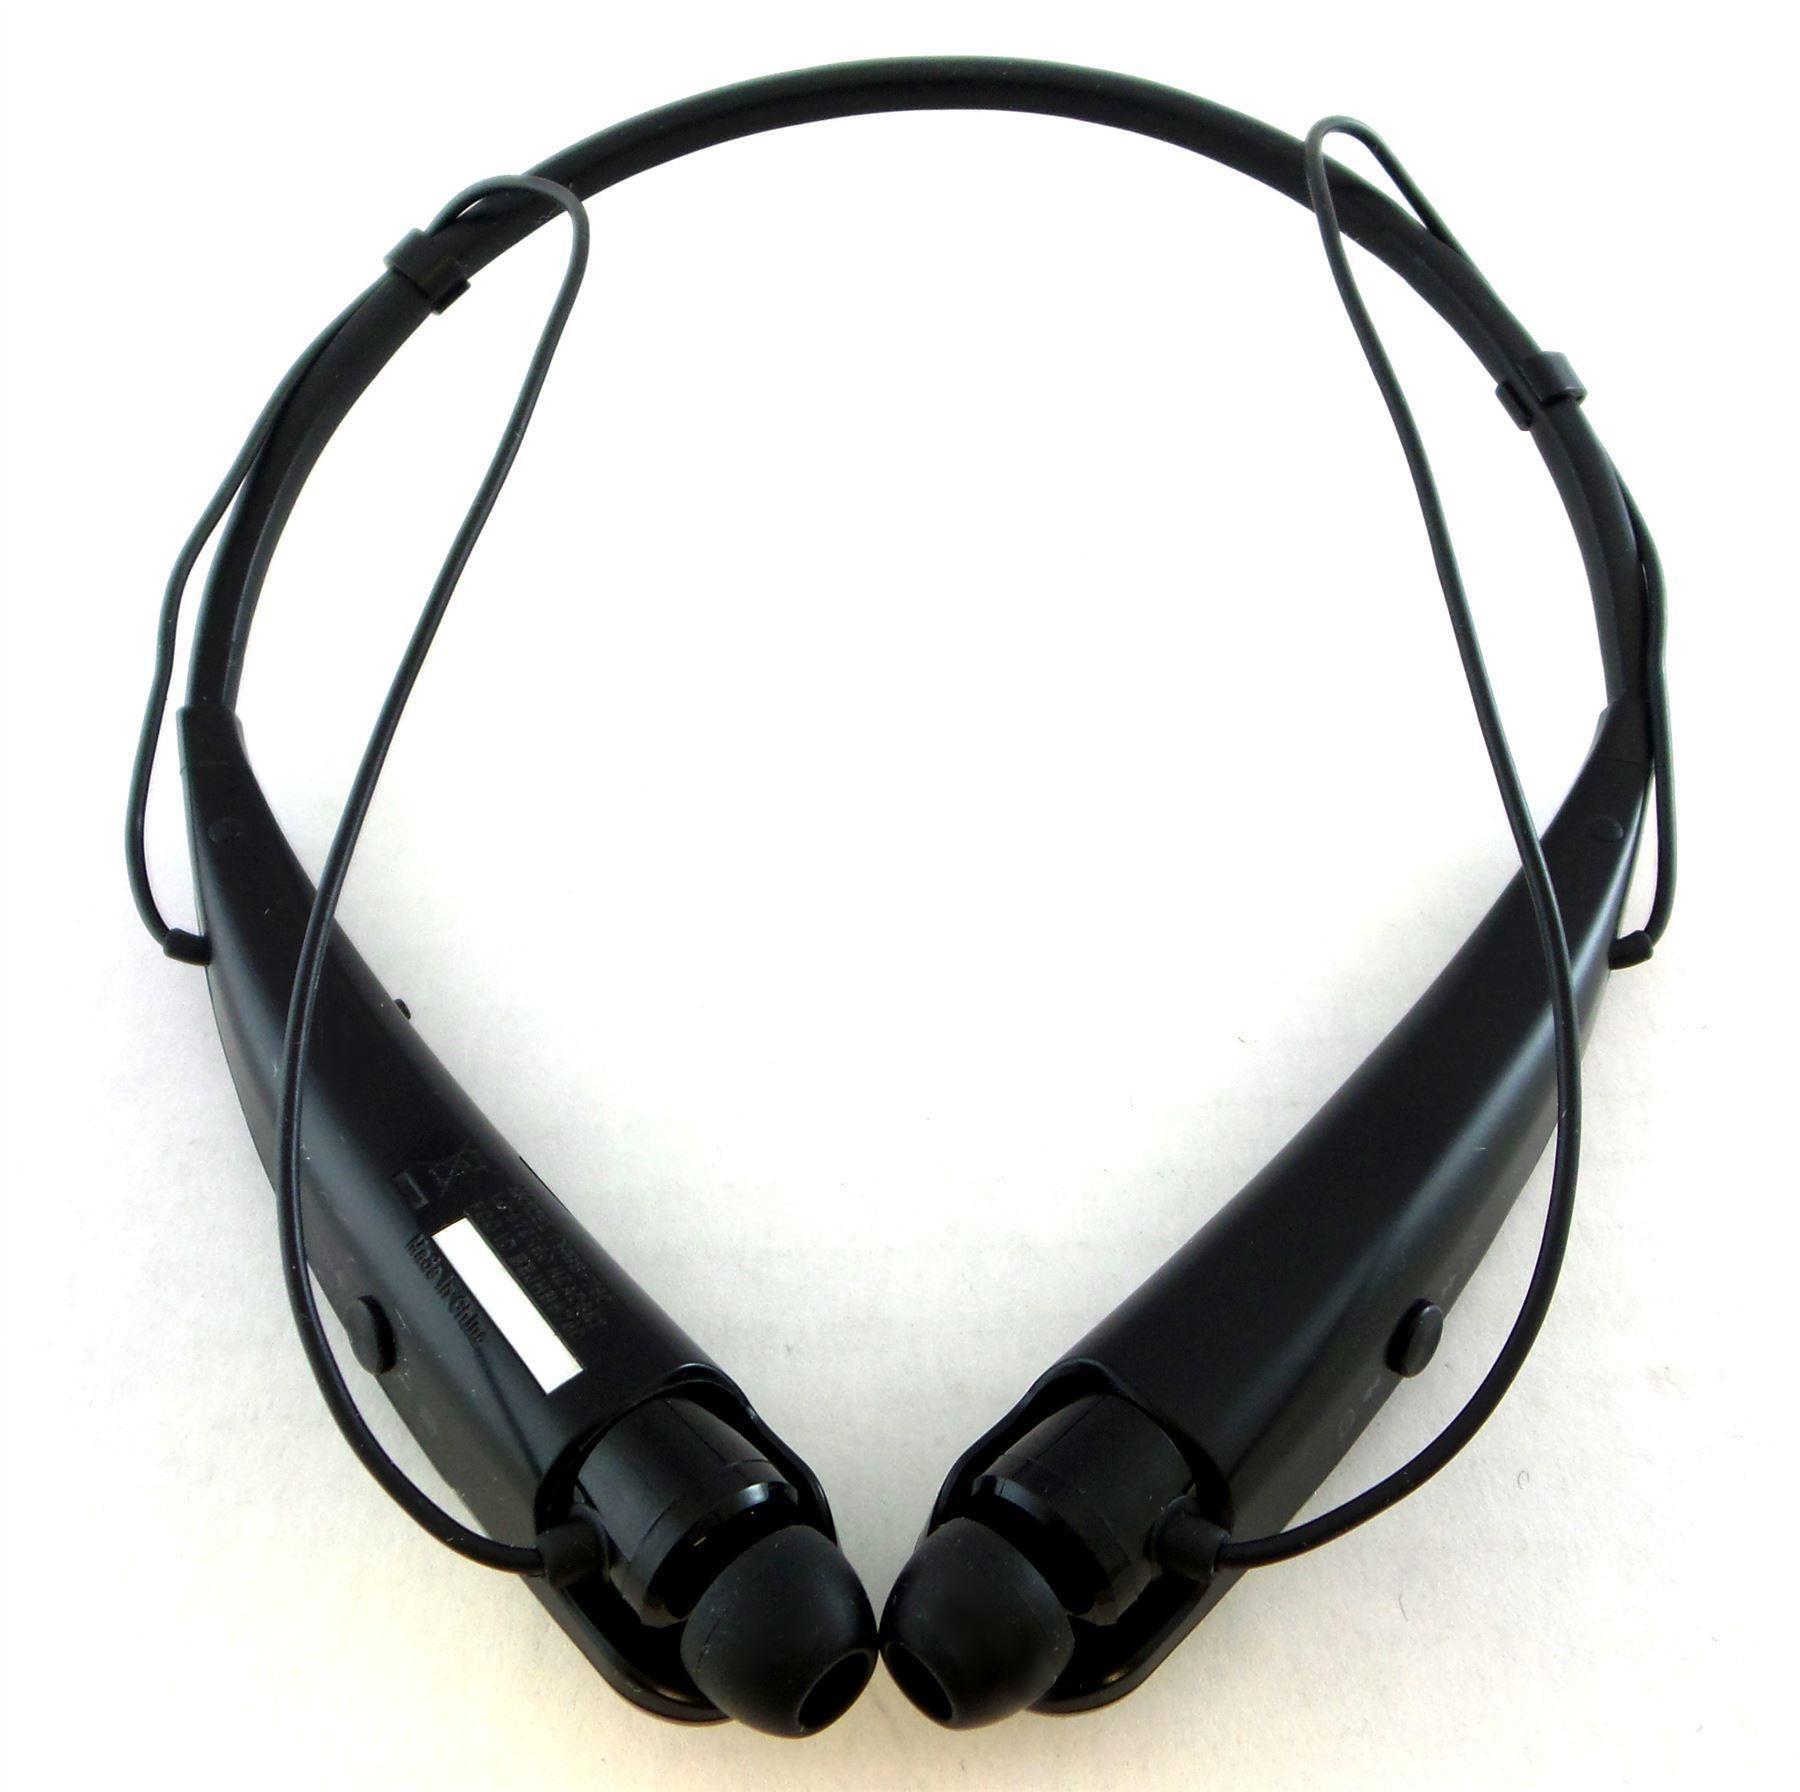 Wireless headphones lg bluetooth 760 - wireless headphones lg bluetooth compatible